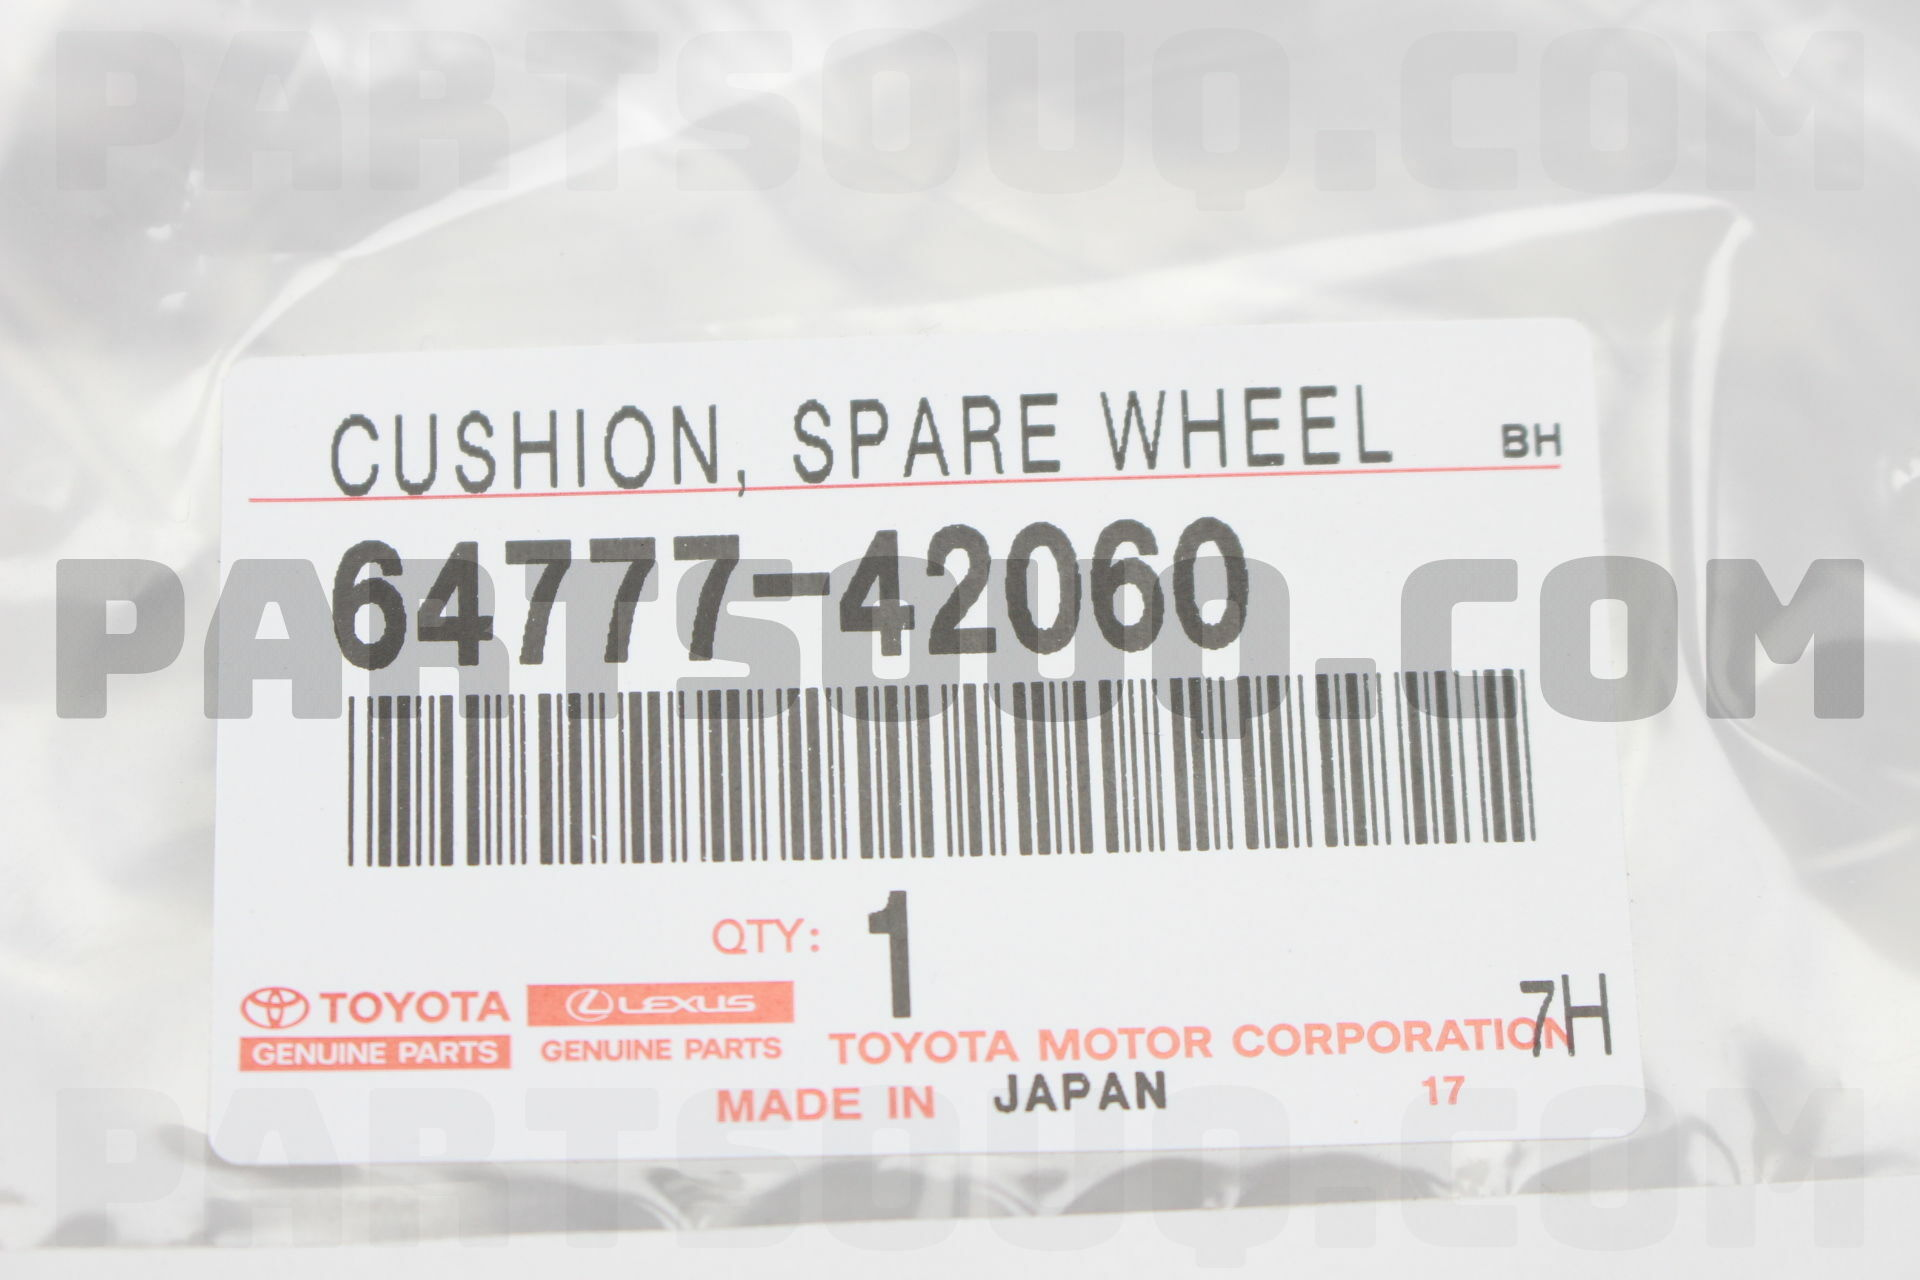 6477742060 Toyota CUSHION, SPARE WHEEL Price: 67.81$, Weight: 0.53kg ...